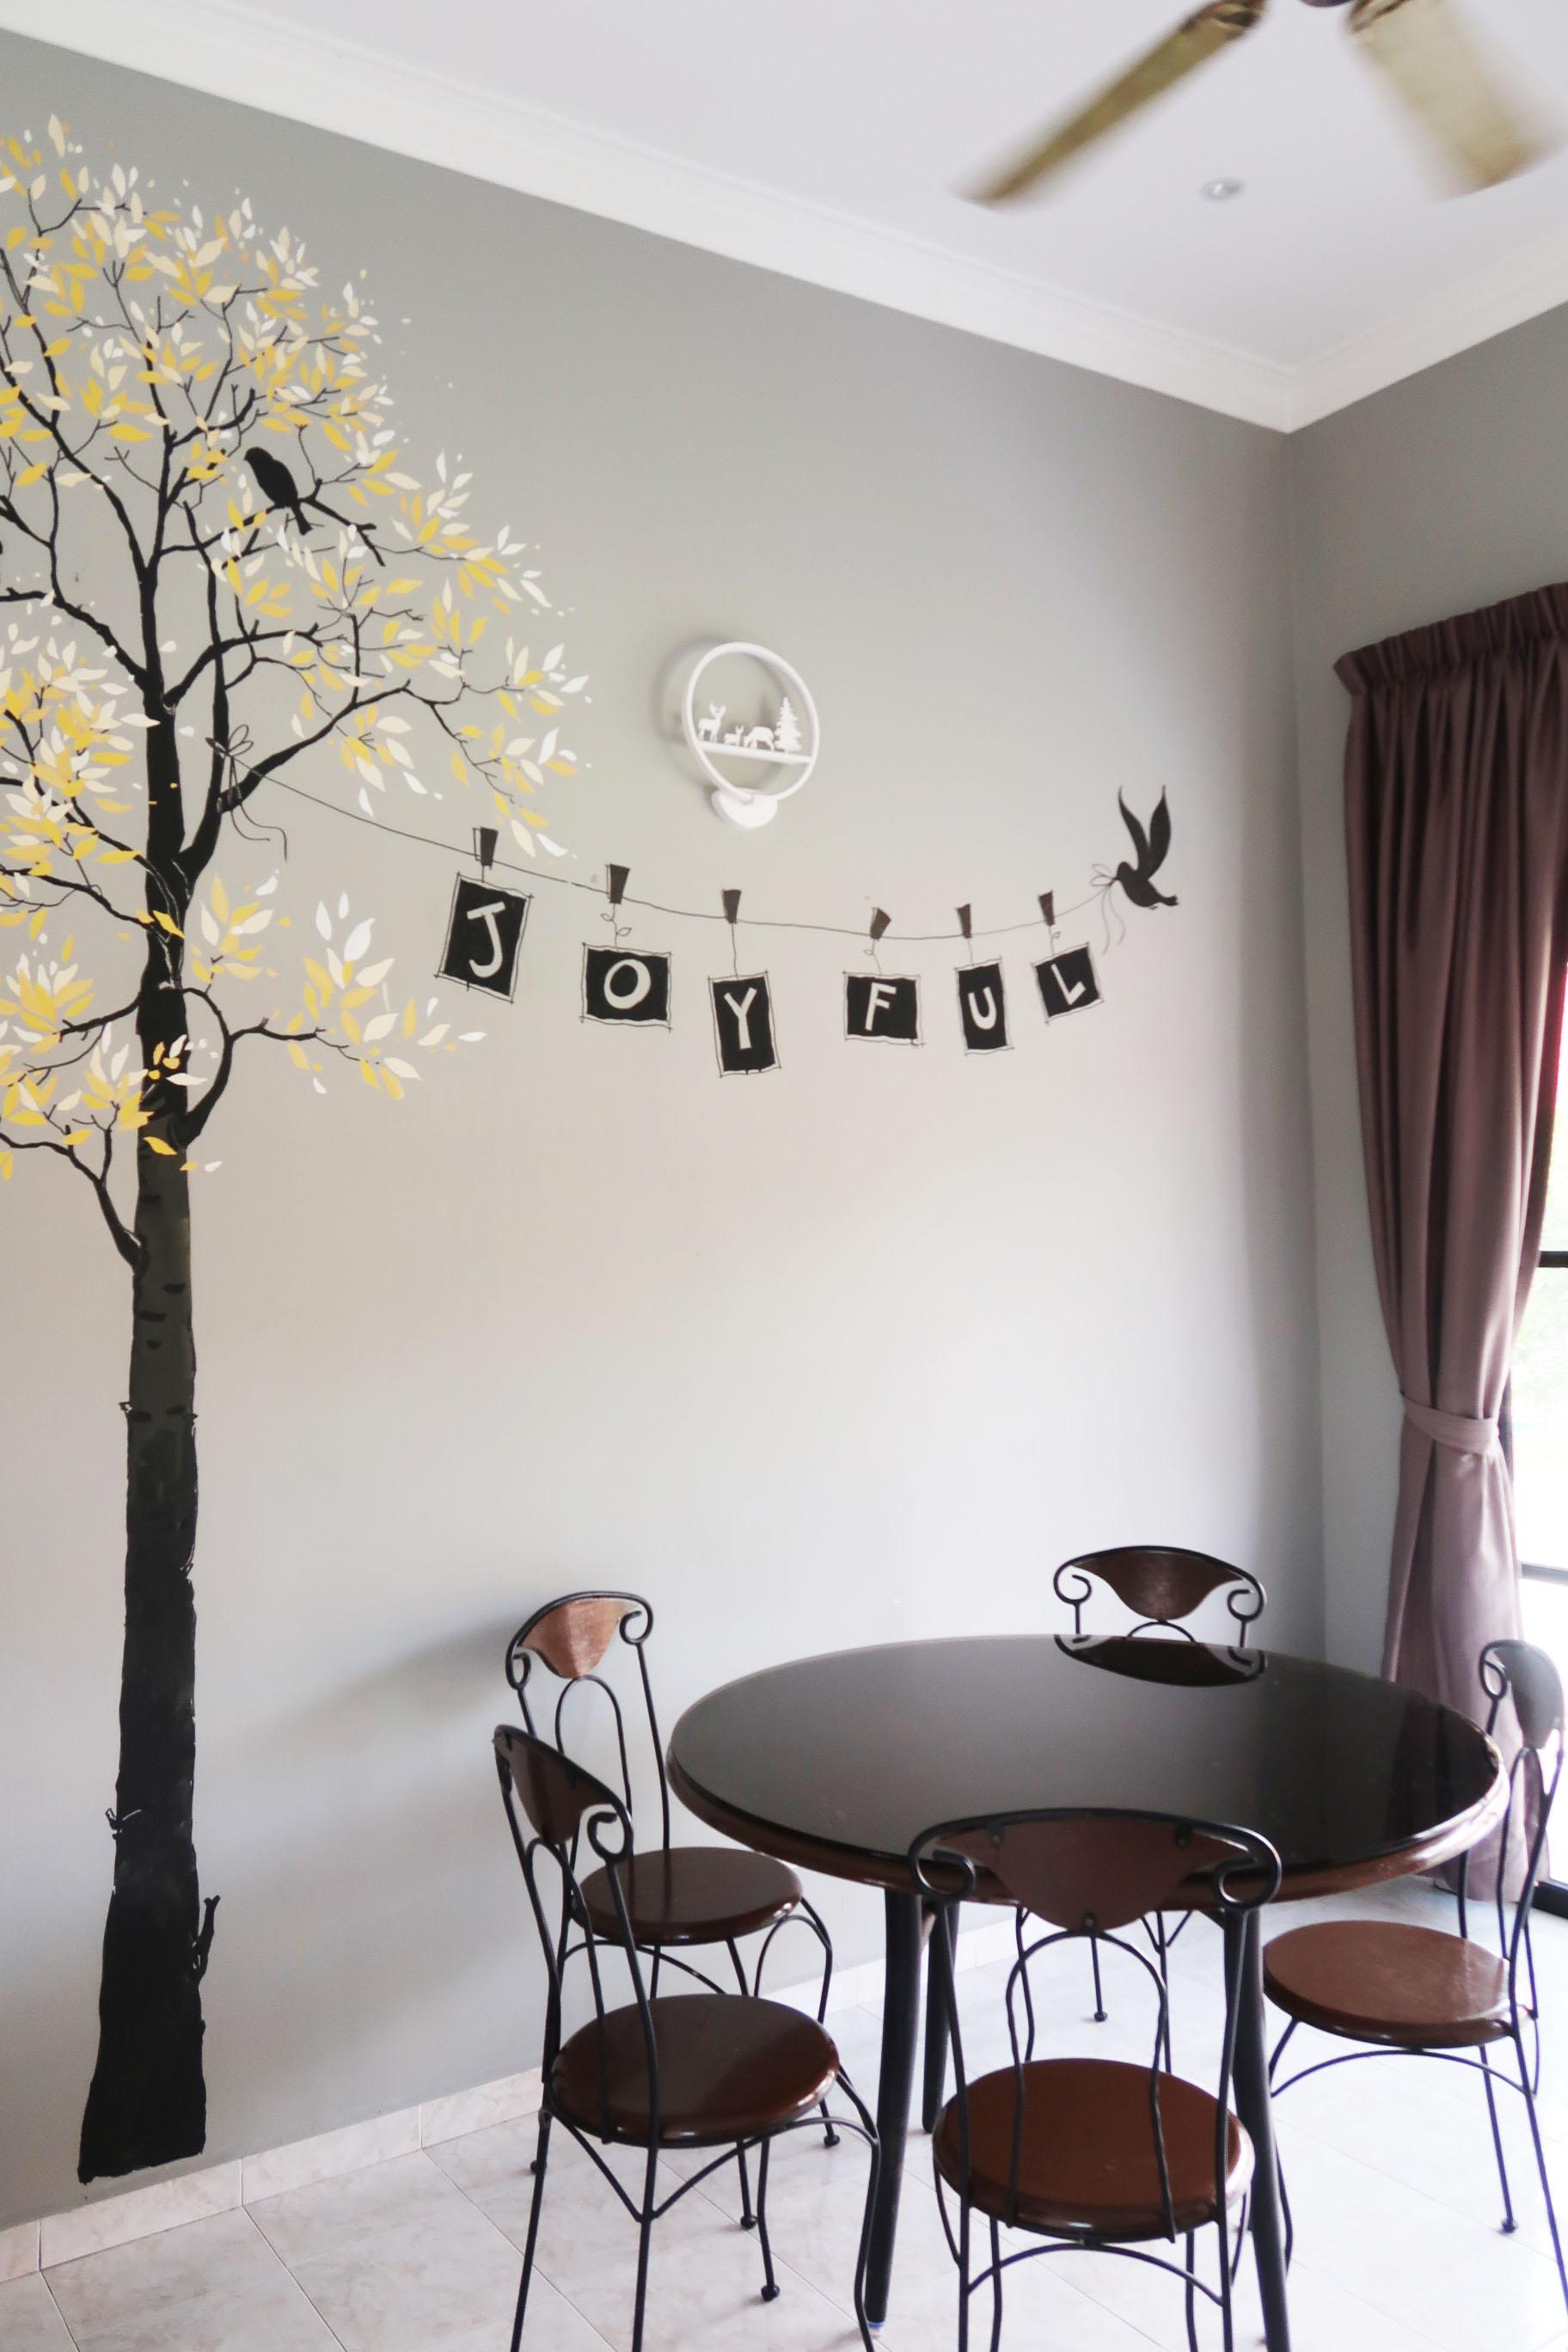 Joyful Villa Dining Hall